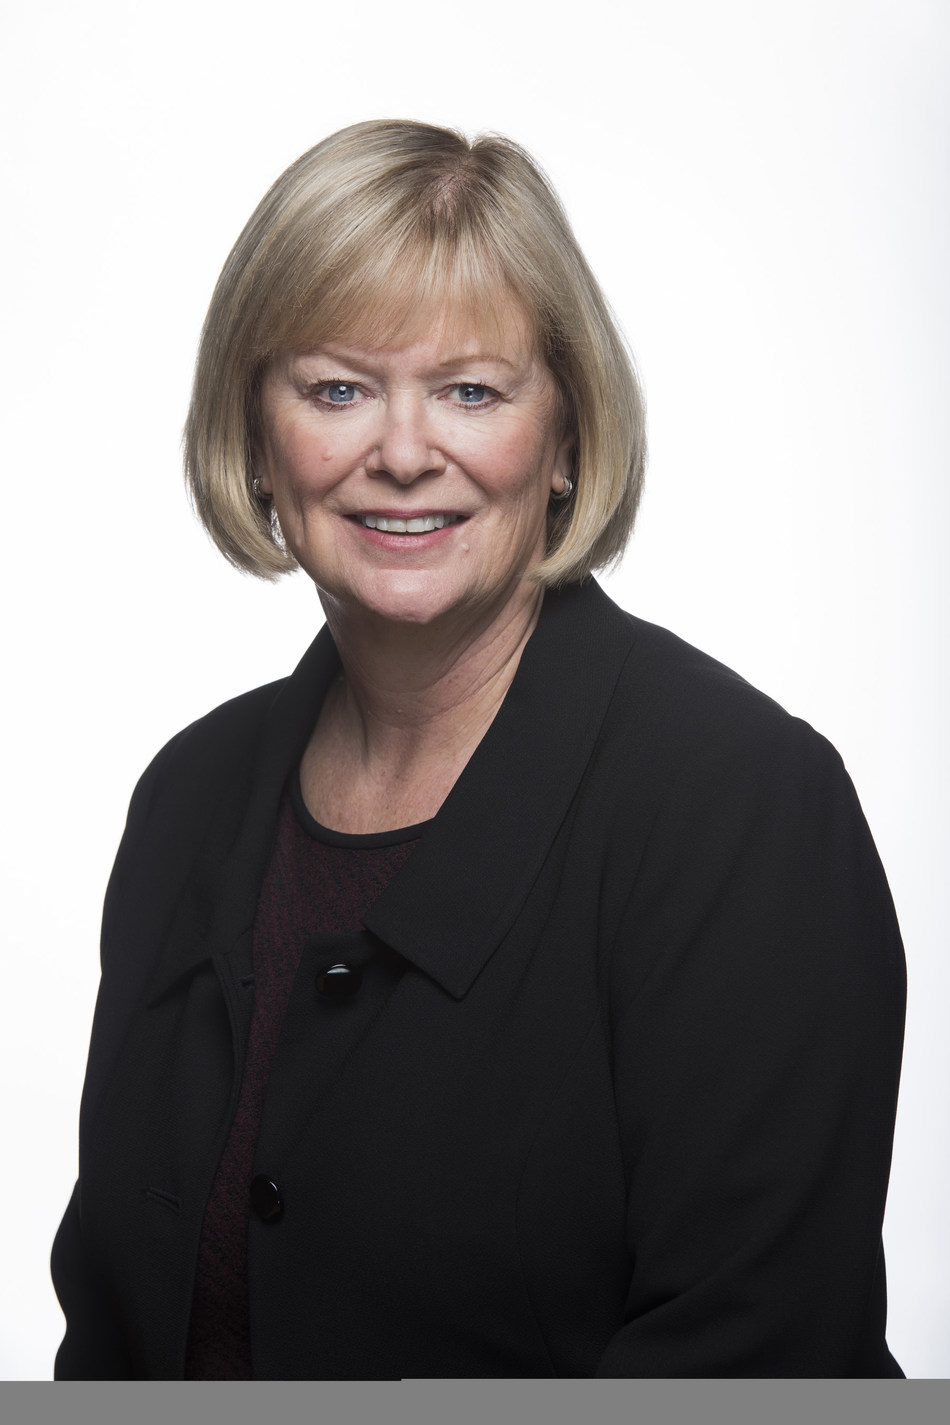 Carol Jardine, President, Wawanesa's P&C Operation (CNW Group/The Wawanesa Mutual Insurance Company)